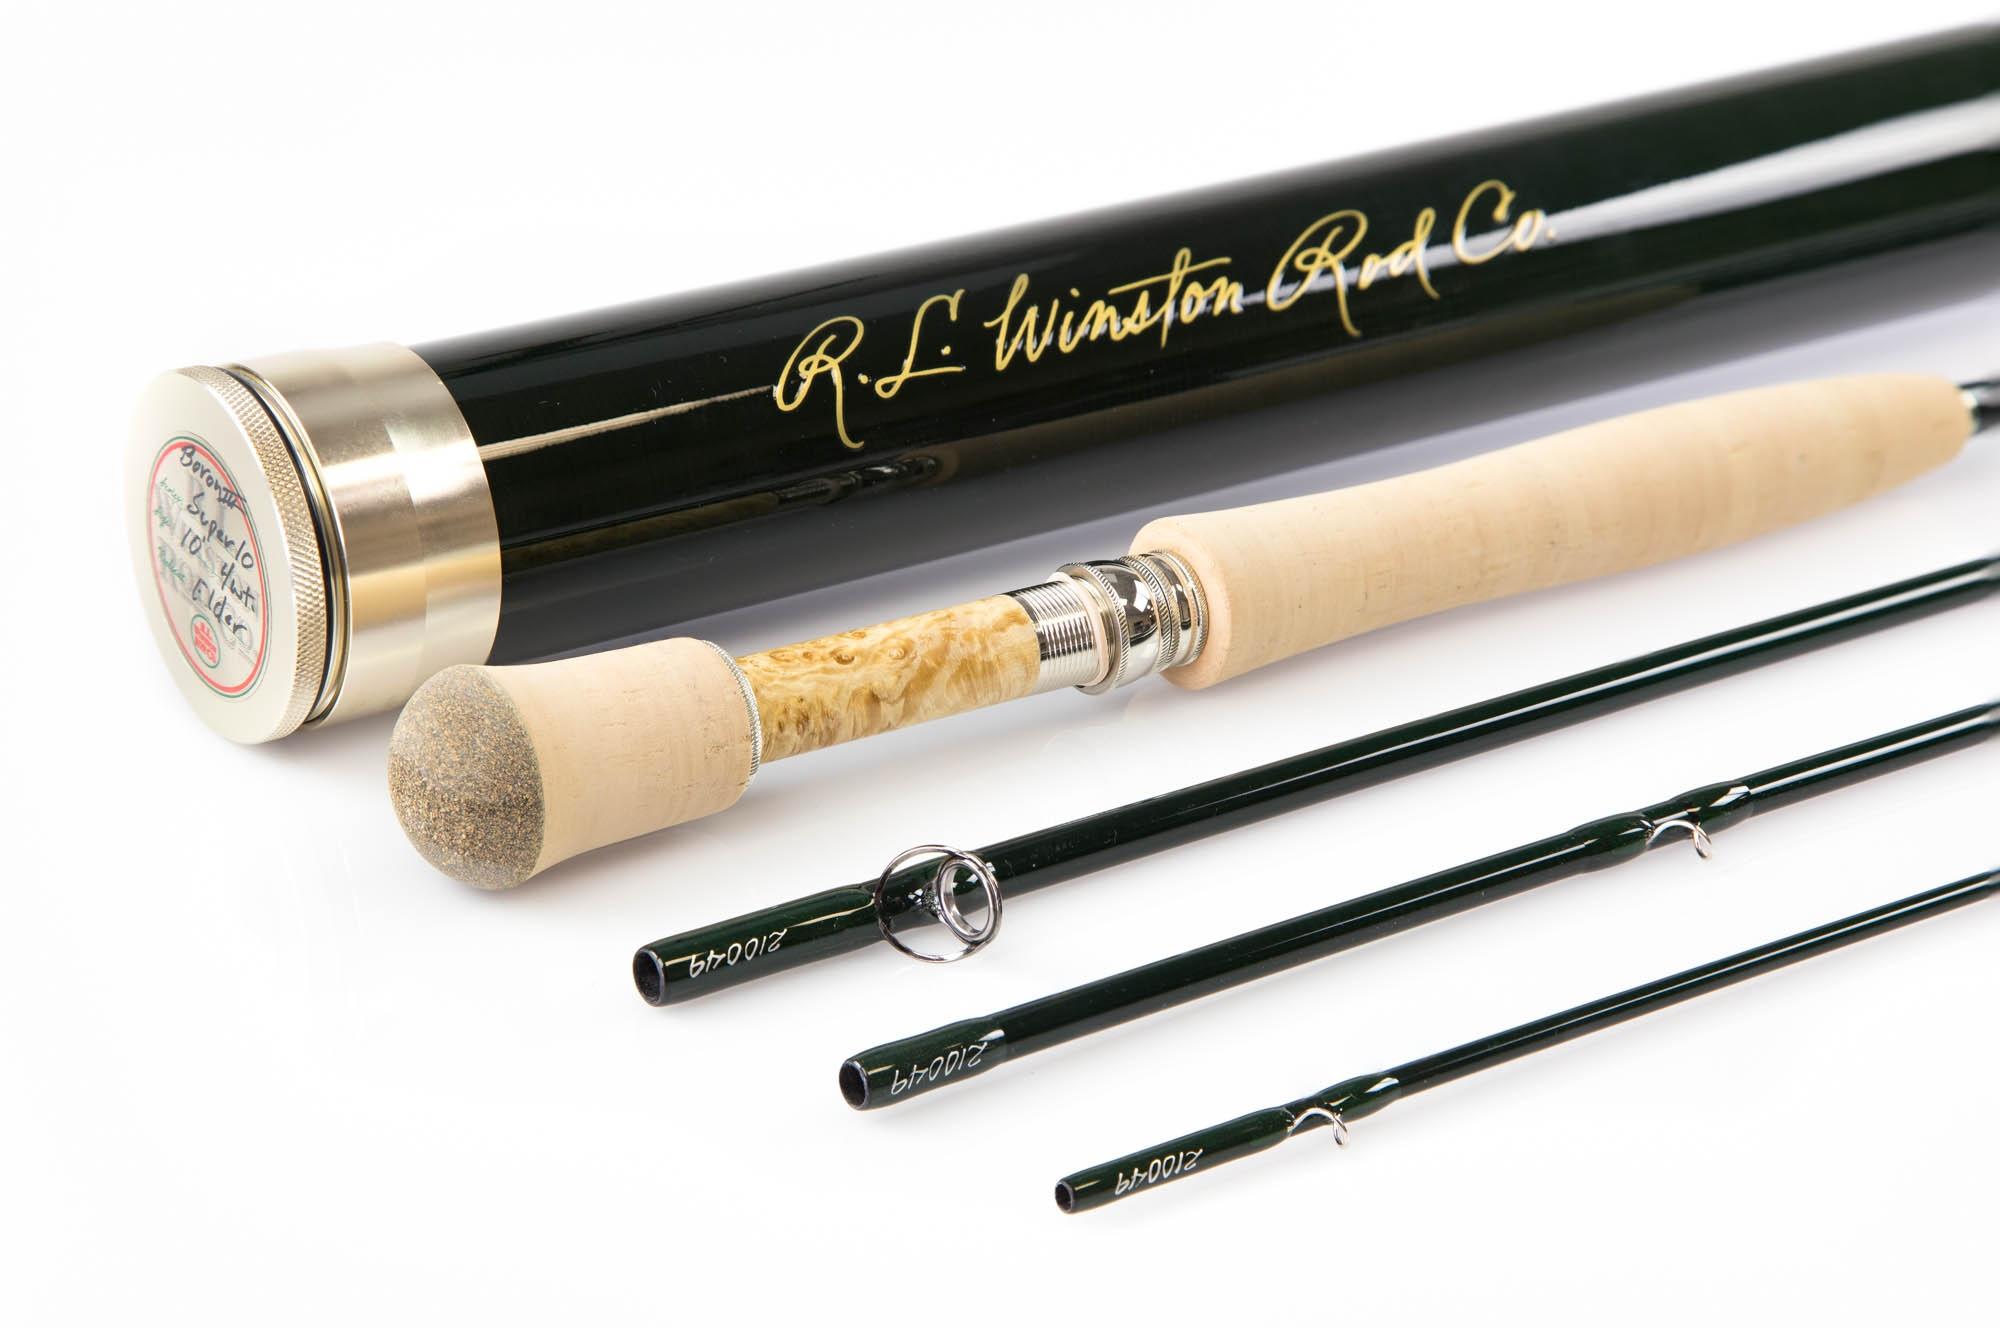 Winston Boron III X Super 10 Fly Rod 100